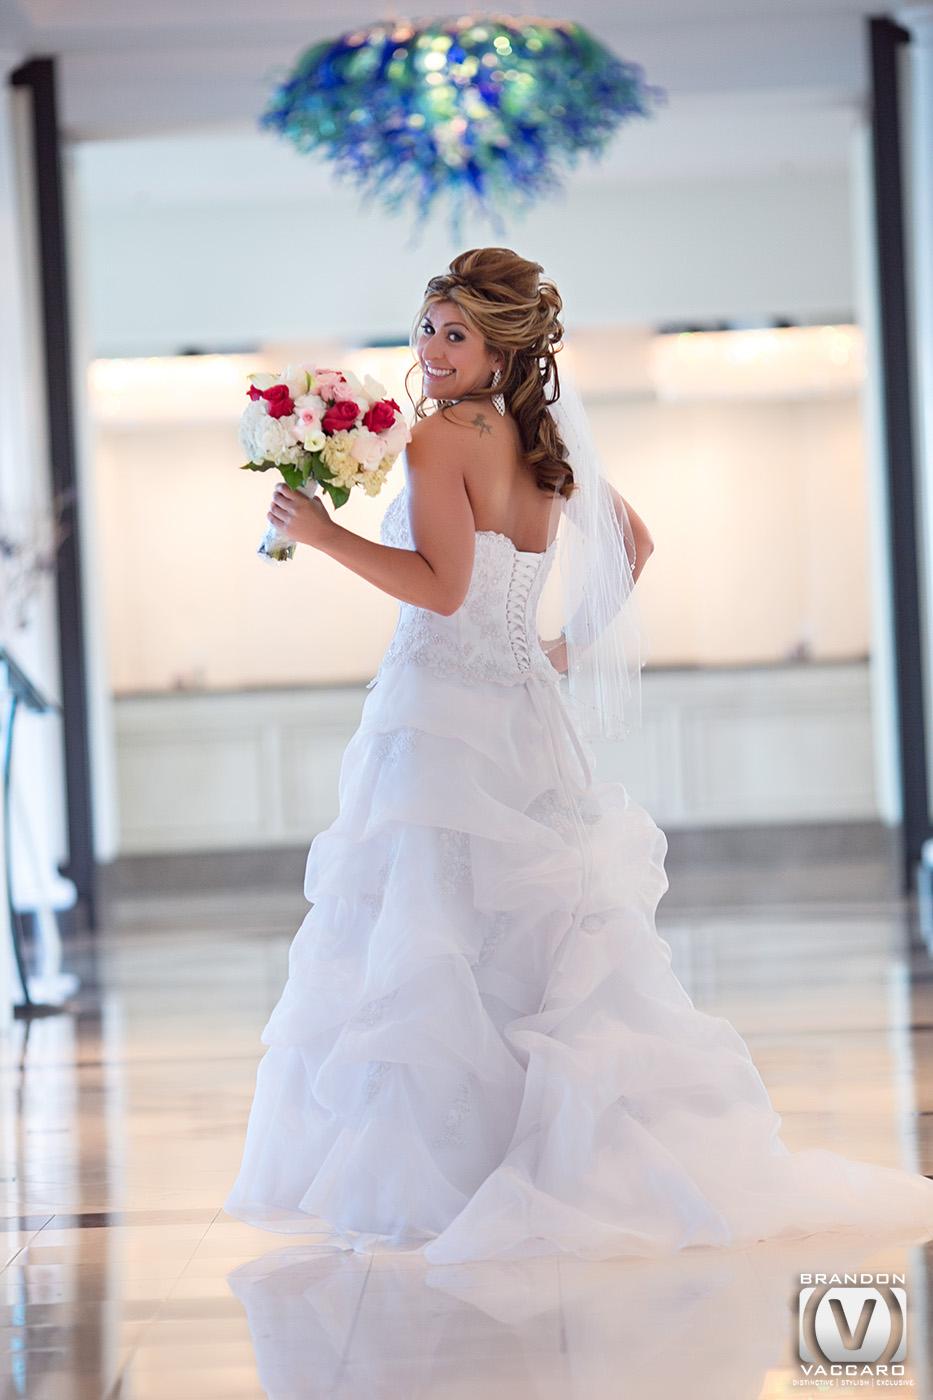 real-wedding-bride-hotel-sofitel-san-francisco-bay-luxury-hotel-redwood-city.jpg